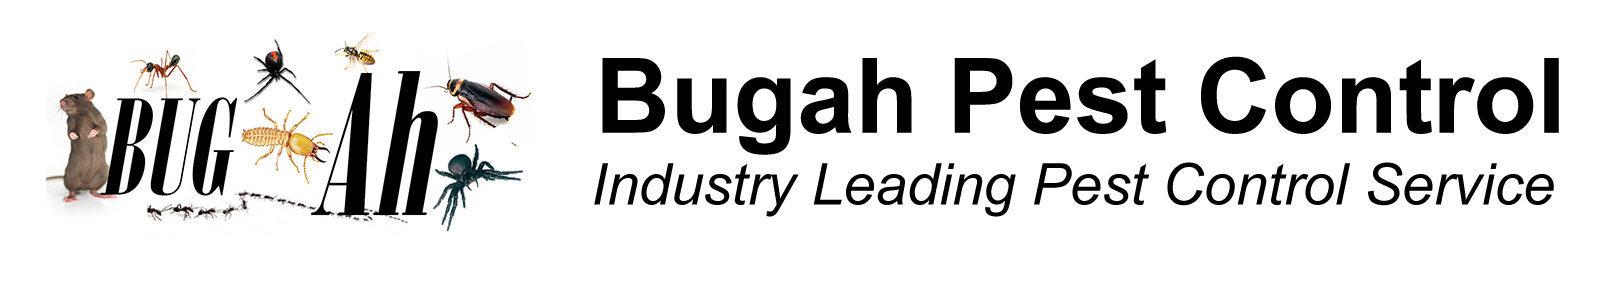 Bugah Pest Control – Commercial & Residential Termite, Flea & Pest Control Services Central Coast